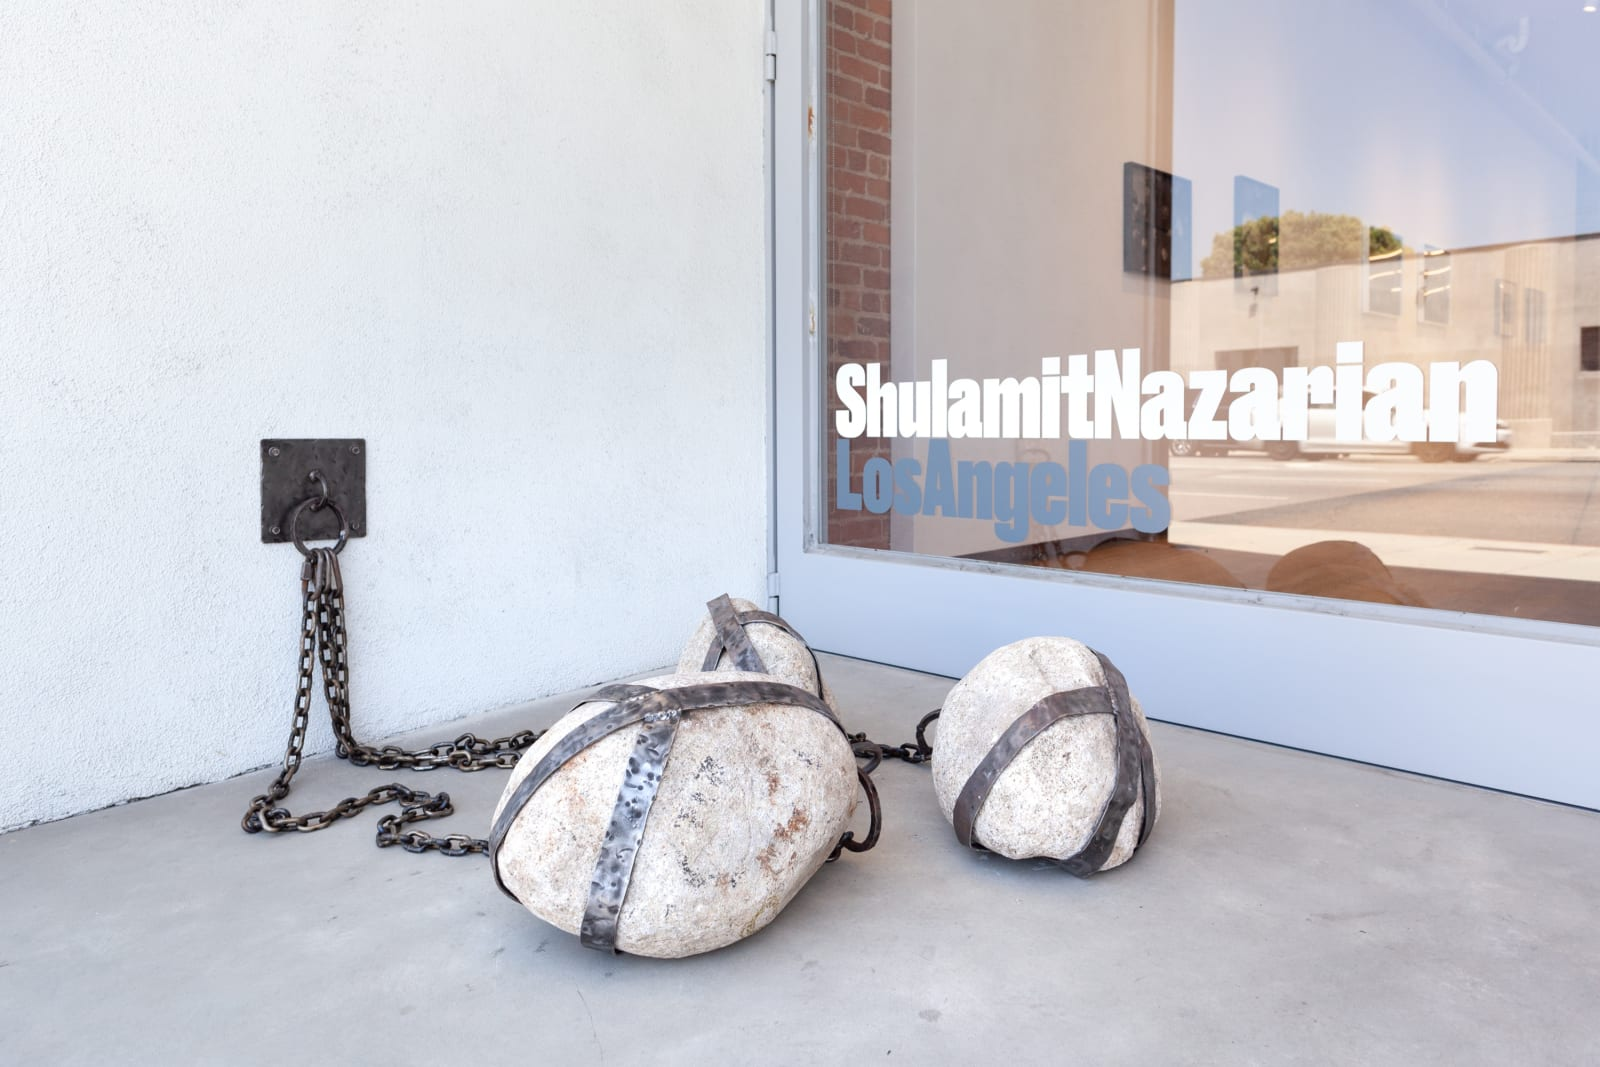 Fay Ray. Hold on Tight, Shulamit Nazarian, Los Angeles, 2020